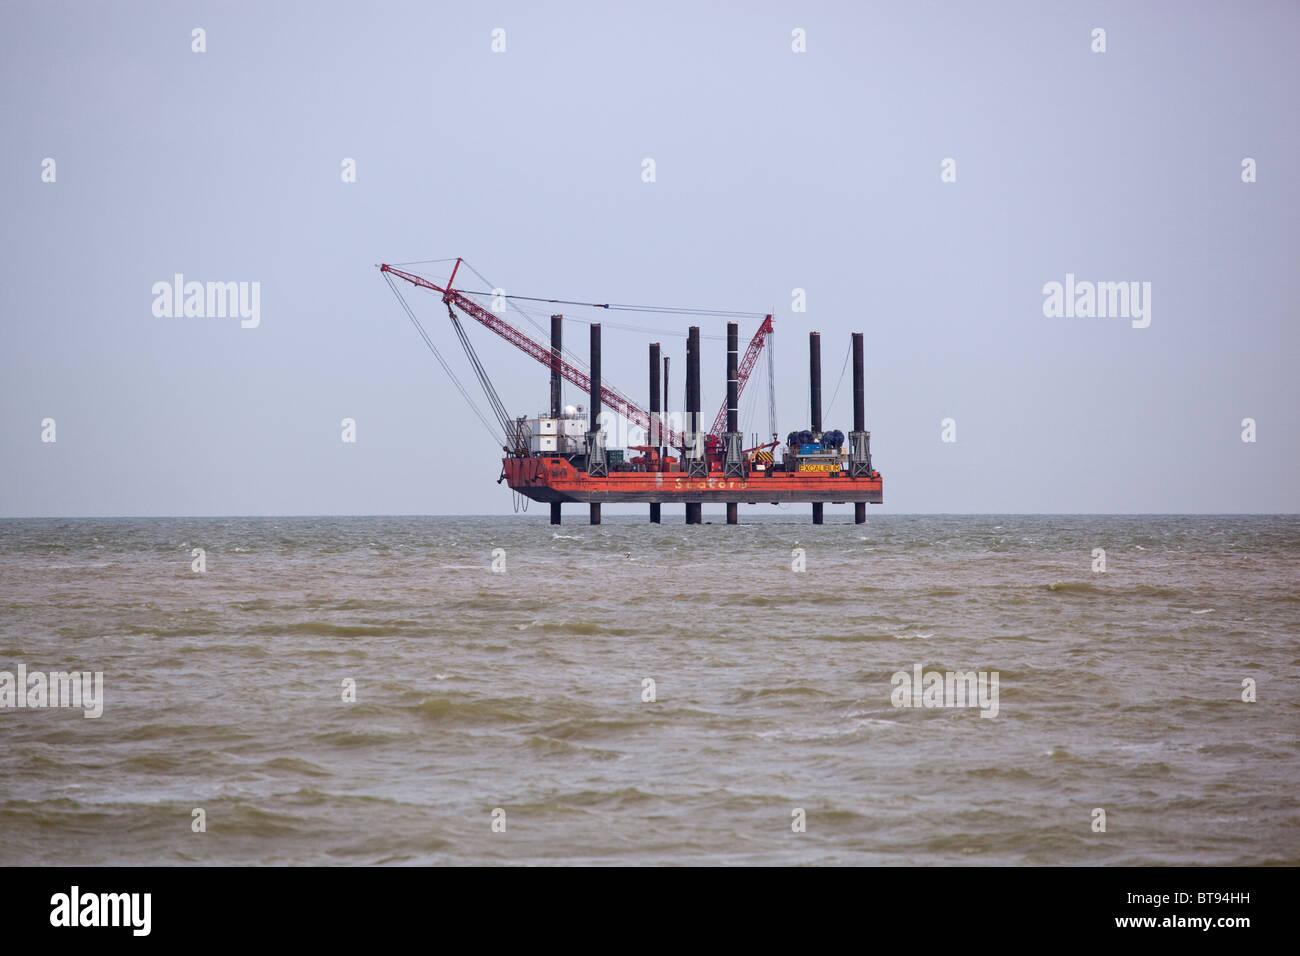 Seacore Excalibur Platform off the coast at Ramsgate Kent - Stock Image